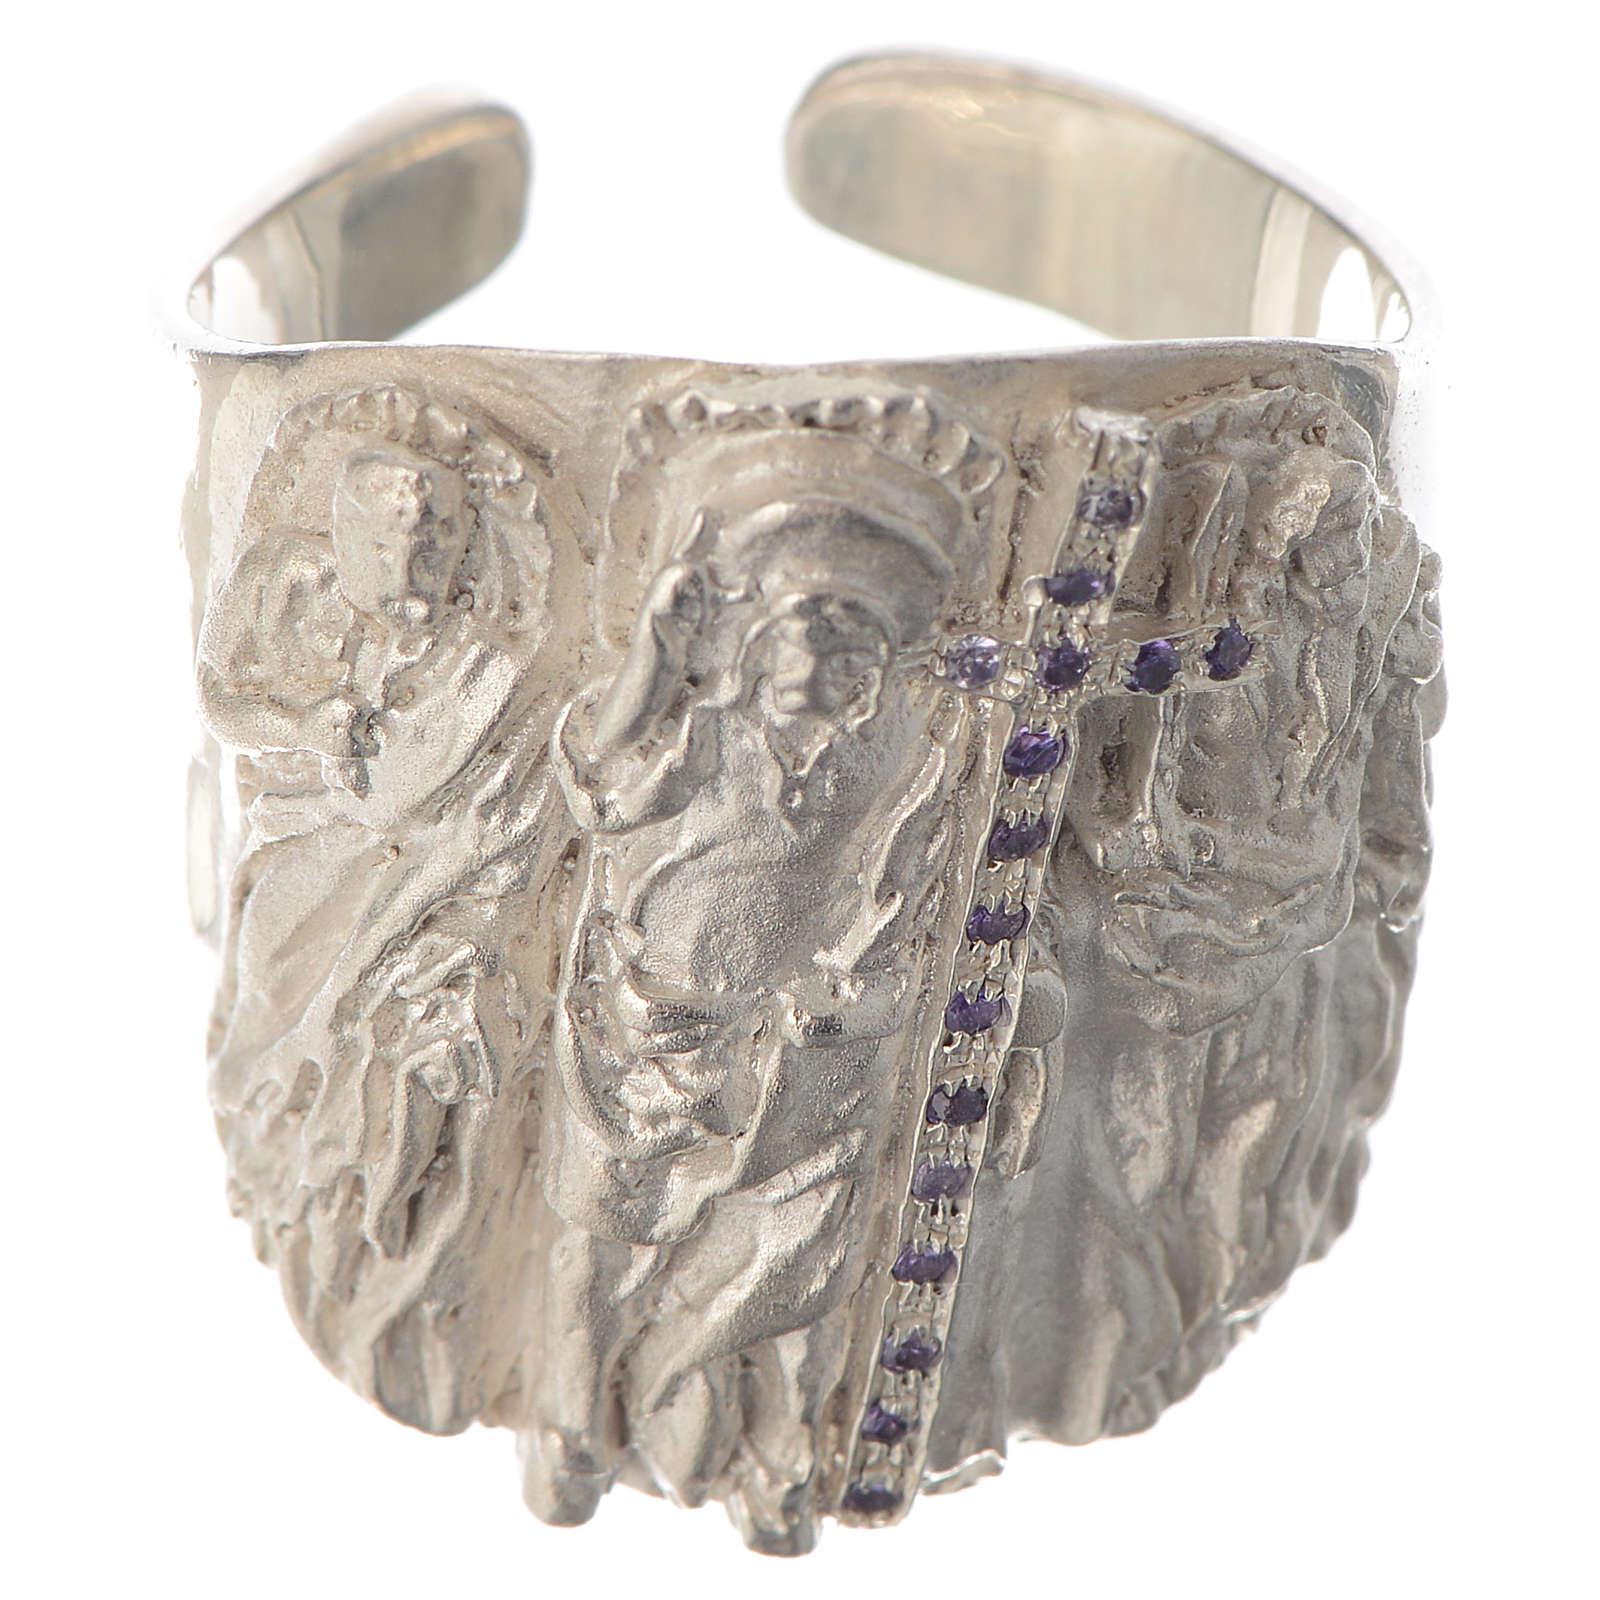 Bishop ring silver 925 and amethyst Jesus 3